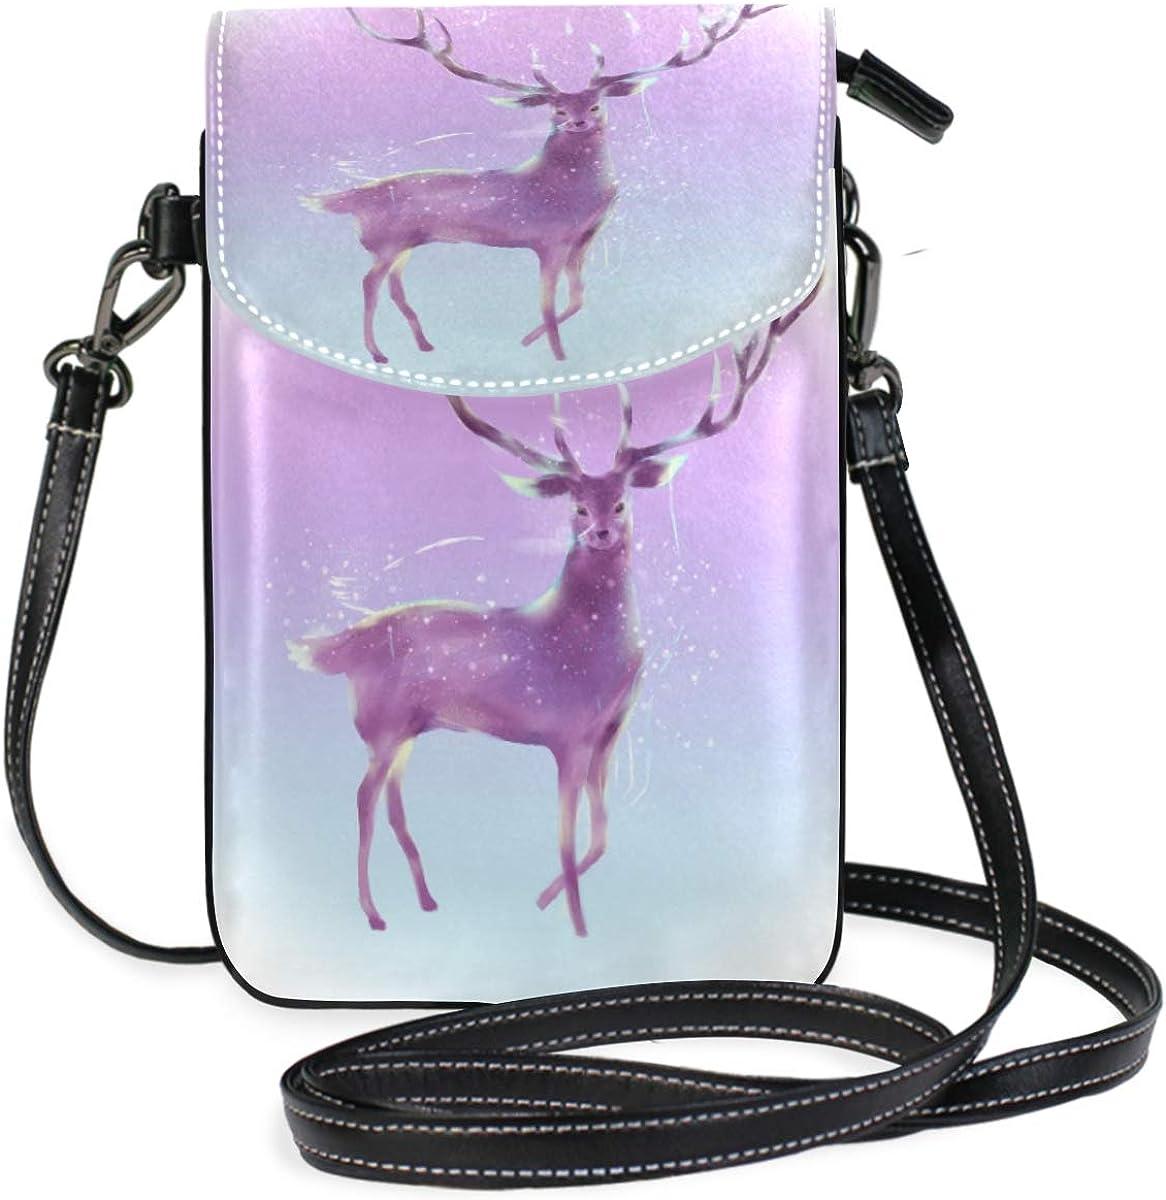 Fantasy Anime Deer Leather Purses Handbags Shoulder Tote Satchel Bags Womens